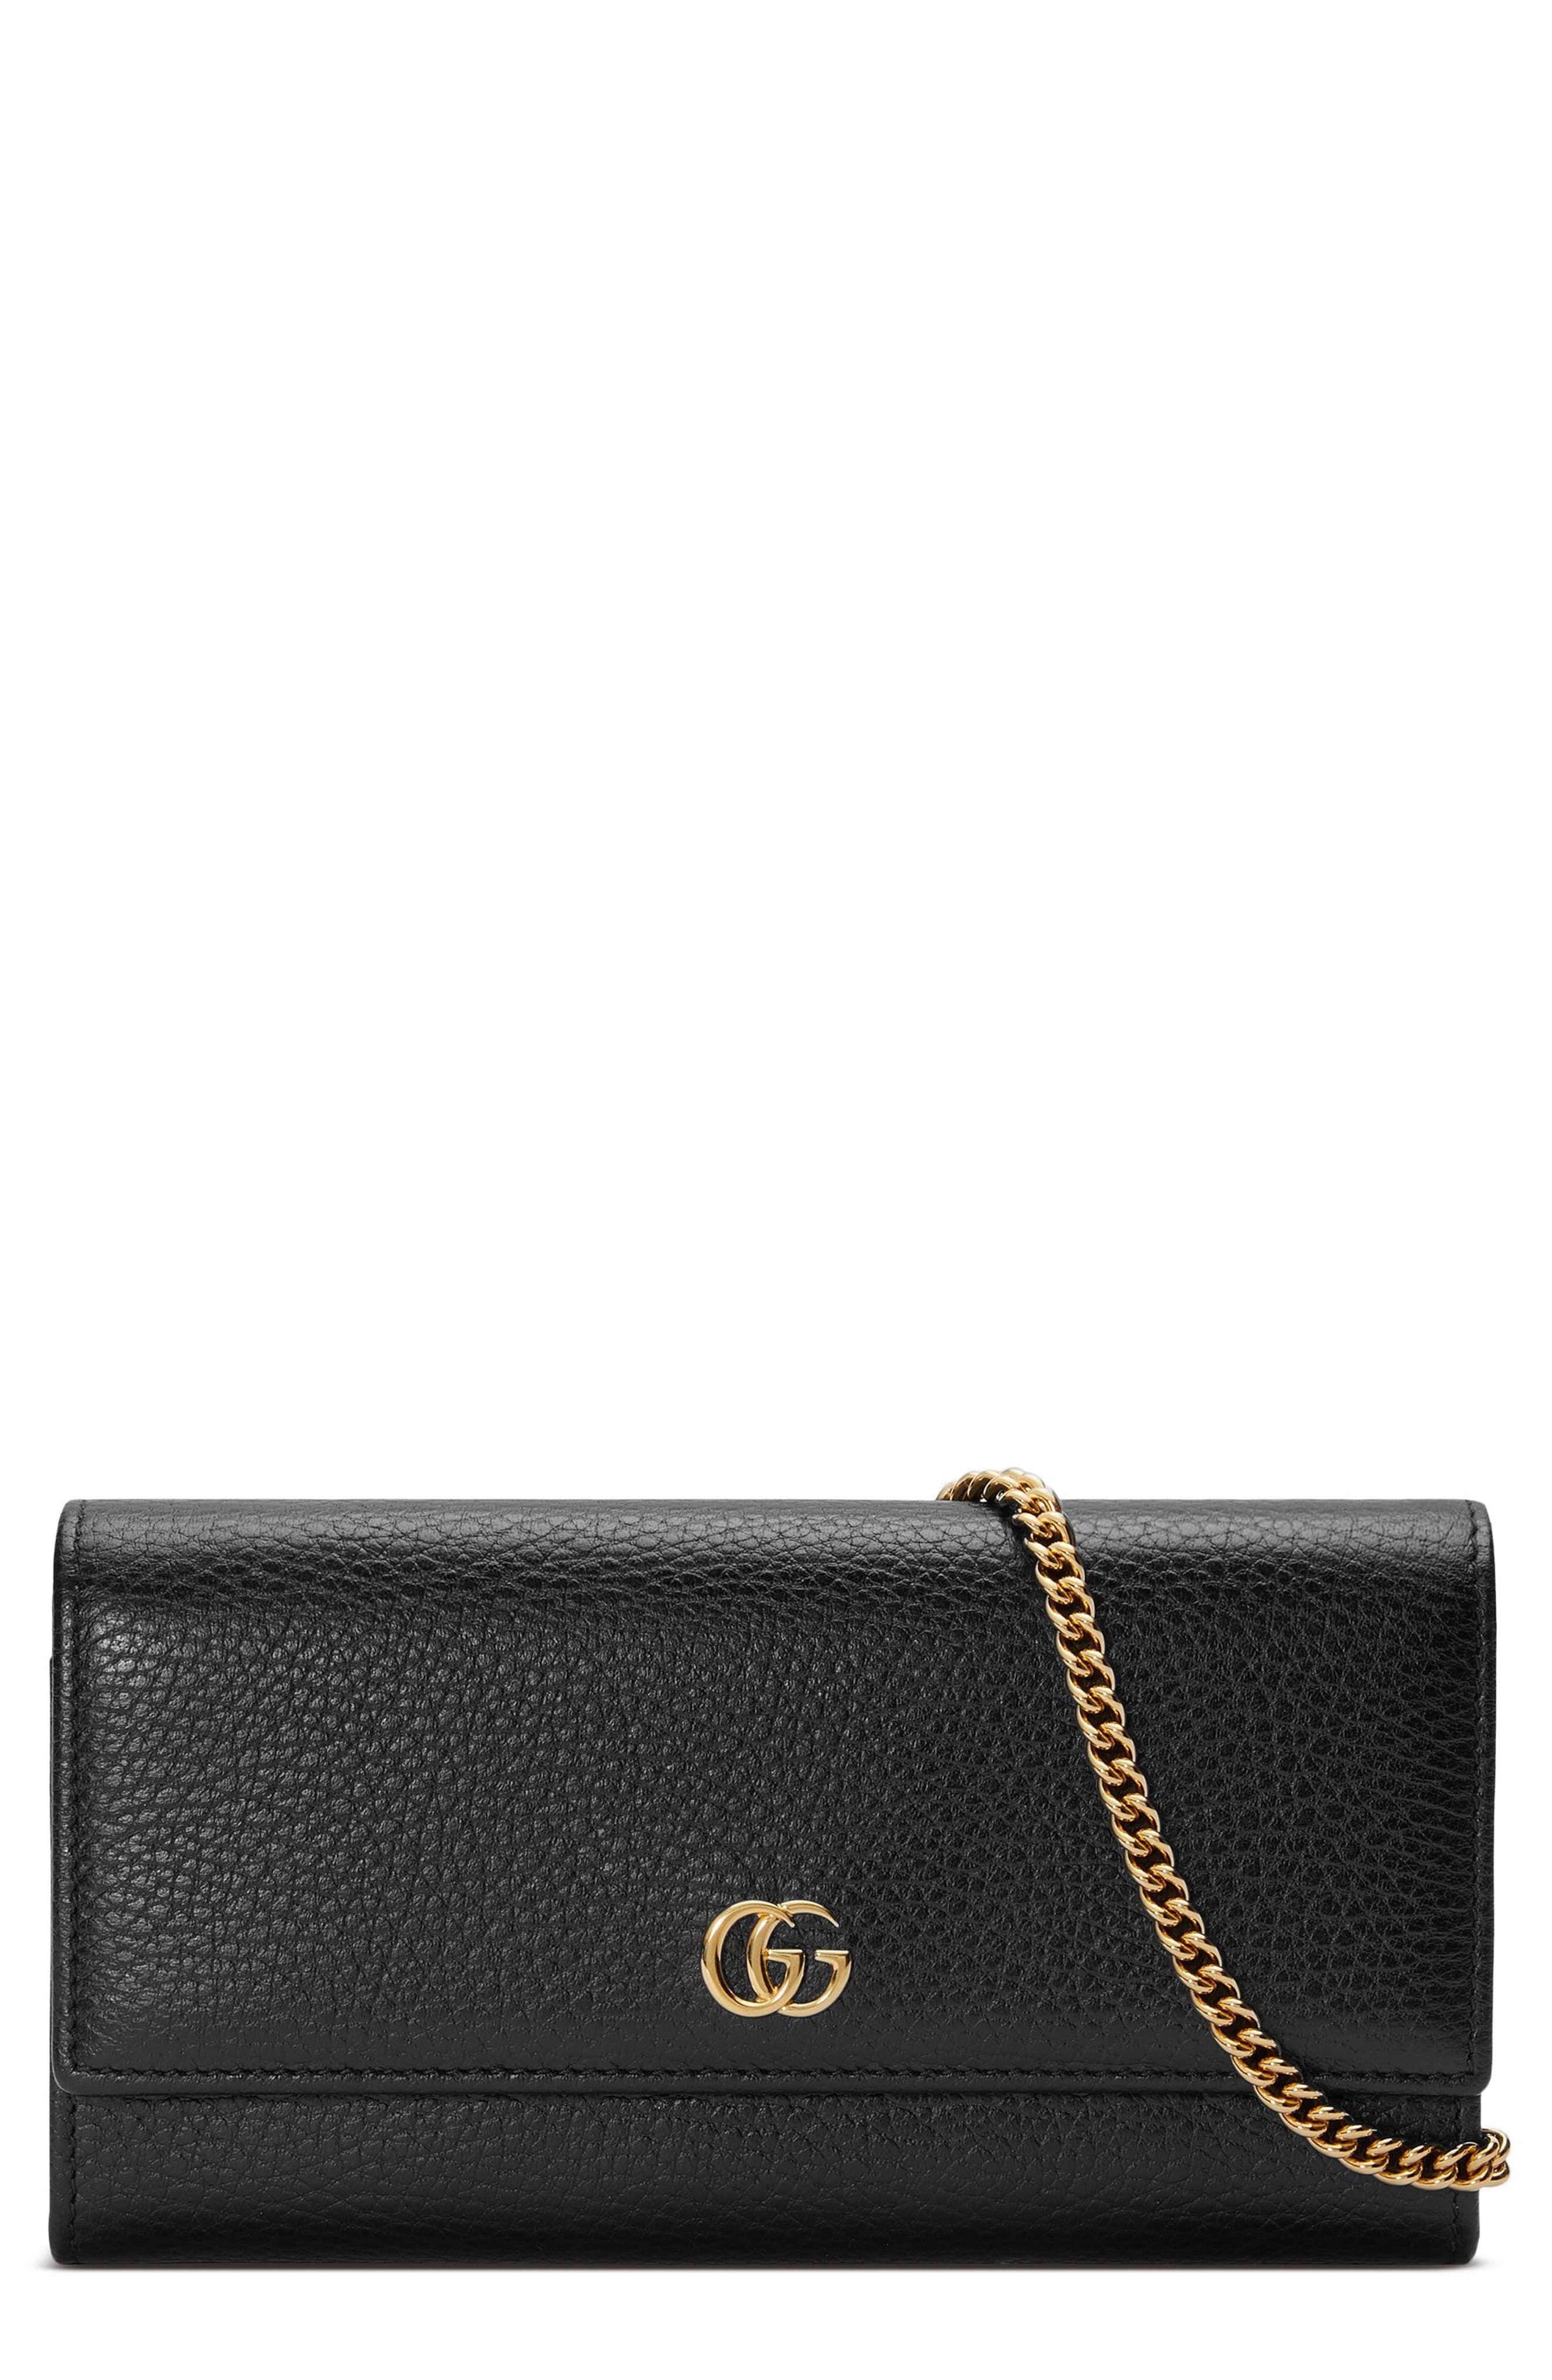 49de30393840e1 Women's Gucci Petite Marmont Leather Continental Wallet On A Chain - Black